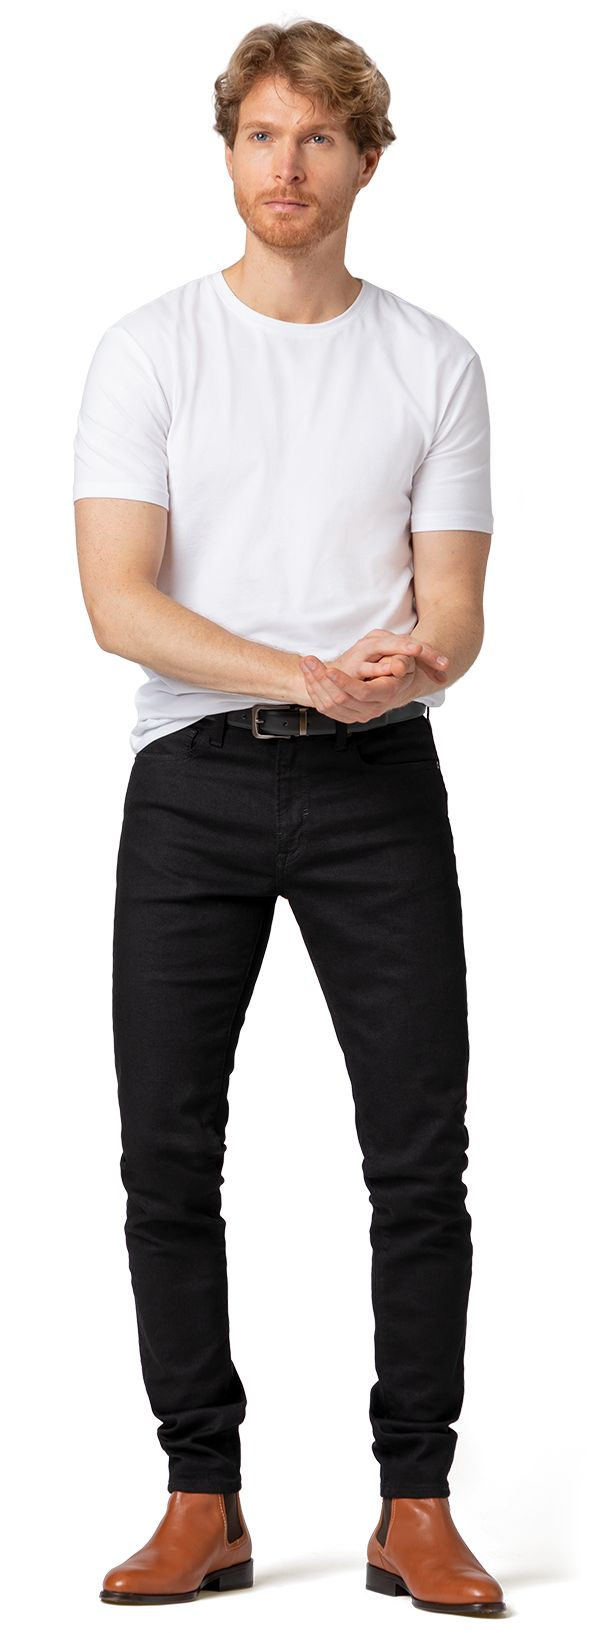 jean noir homme